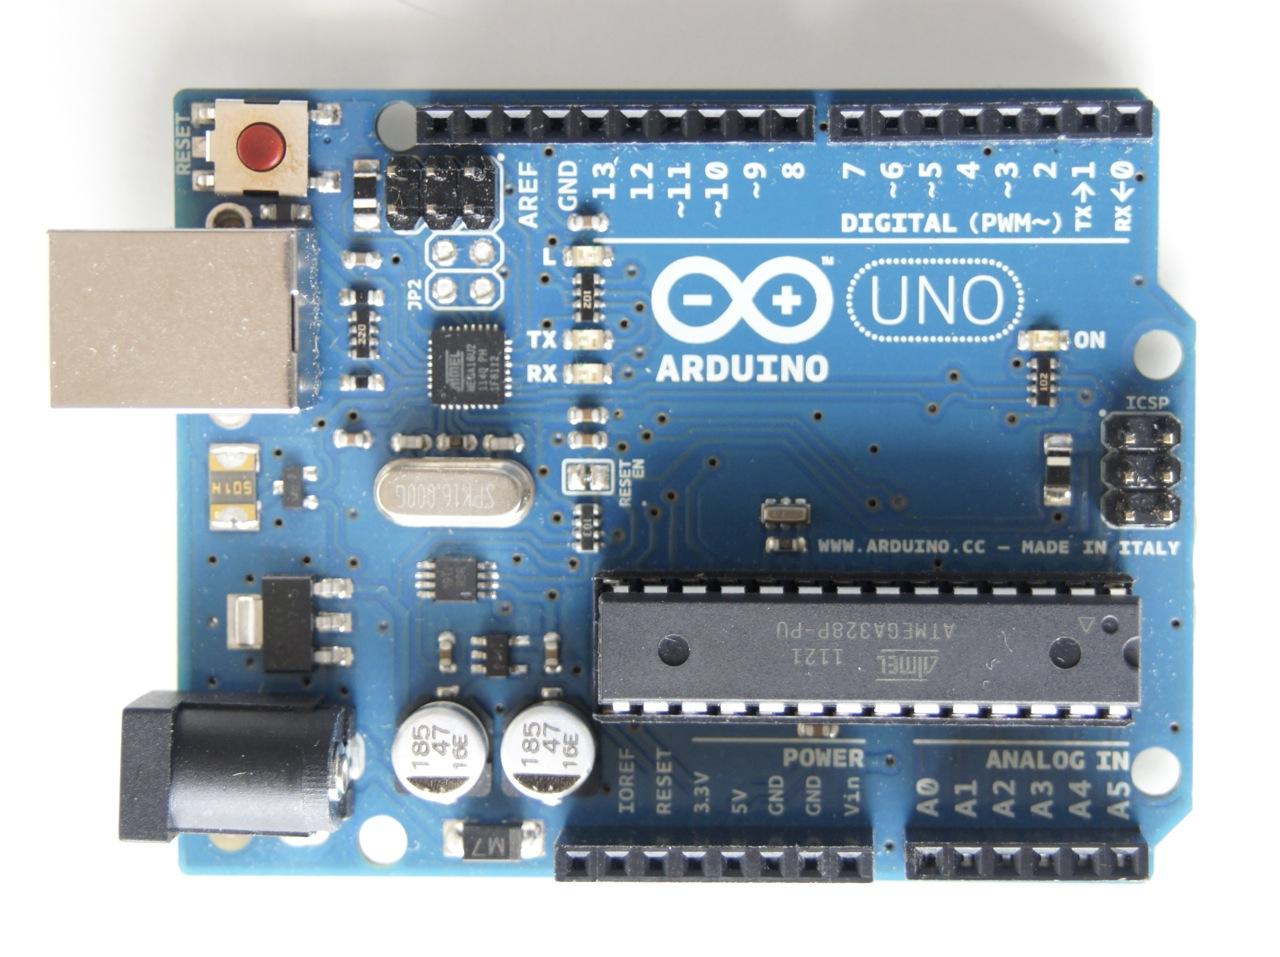 Digital Diner: Arduino Uno vs BeagleBone vs Raspberry Pi